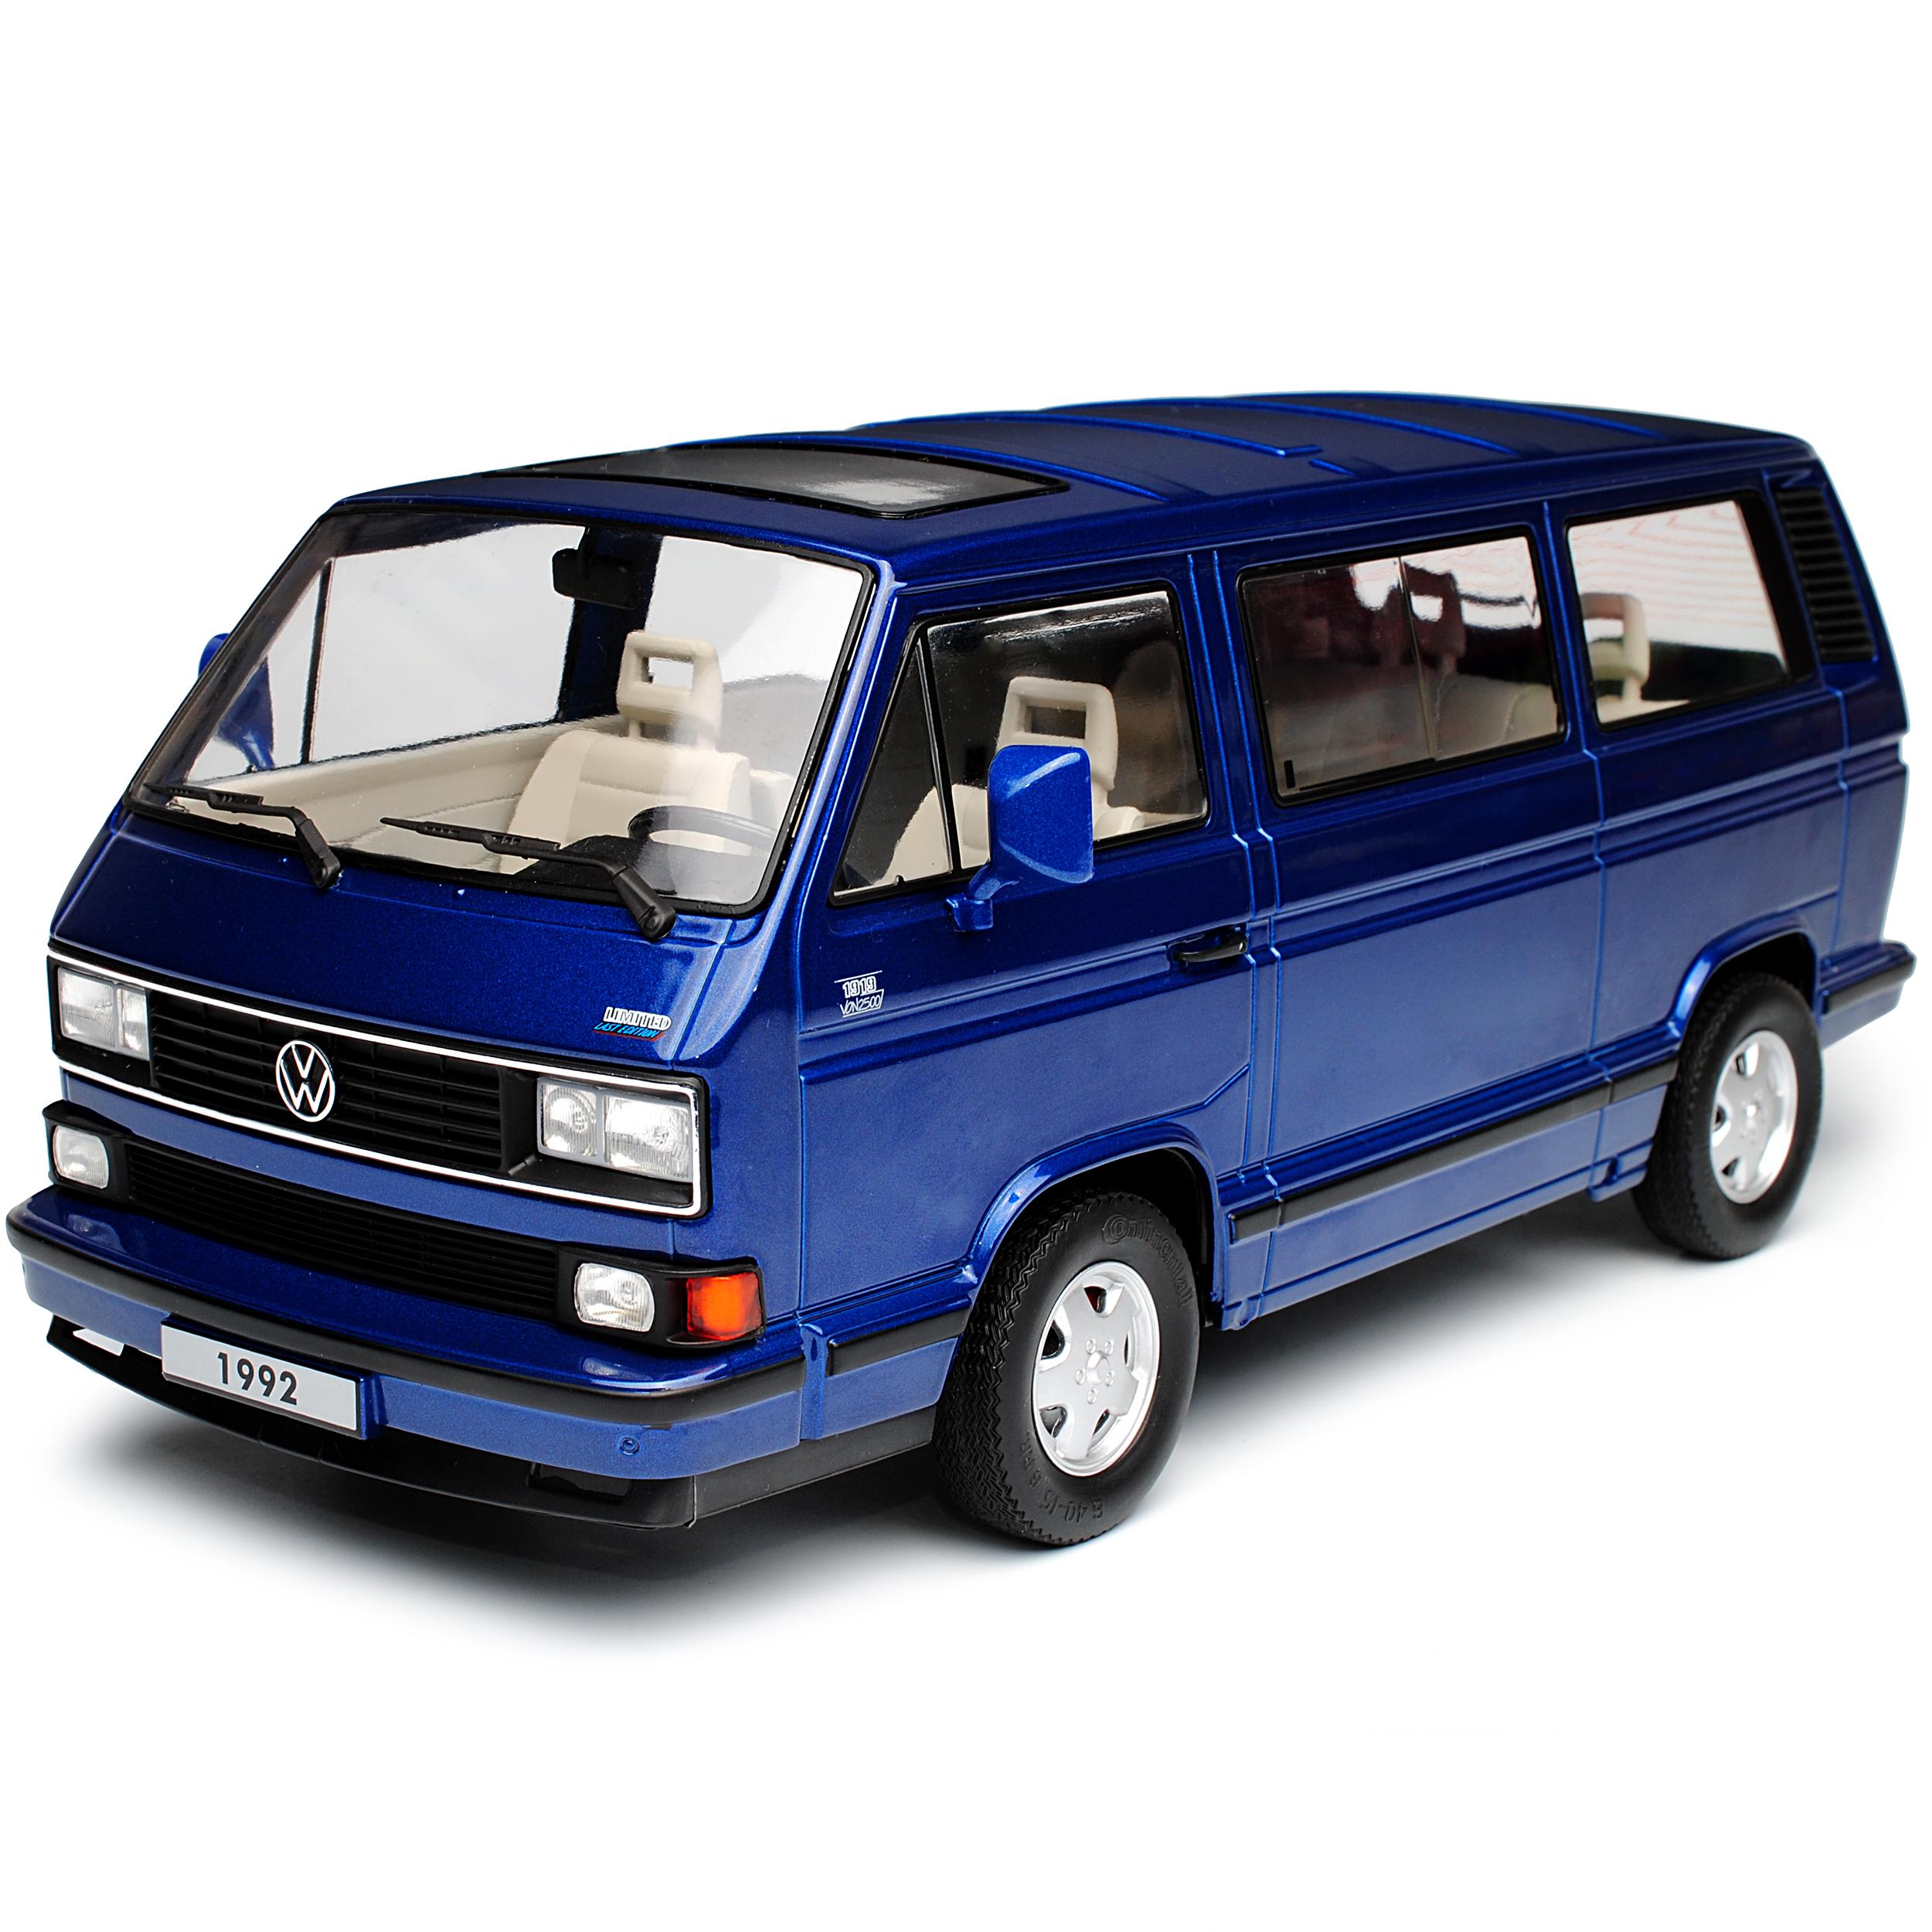 Autobus-de-VW-Volkswagen-T3-Multivan-Blau-transporter-1979-1992-edicion-limitada-1-de-1750 miniatura 7